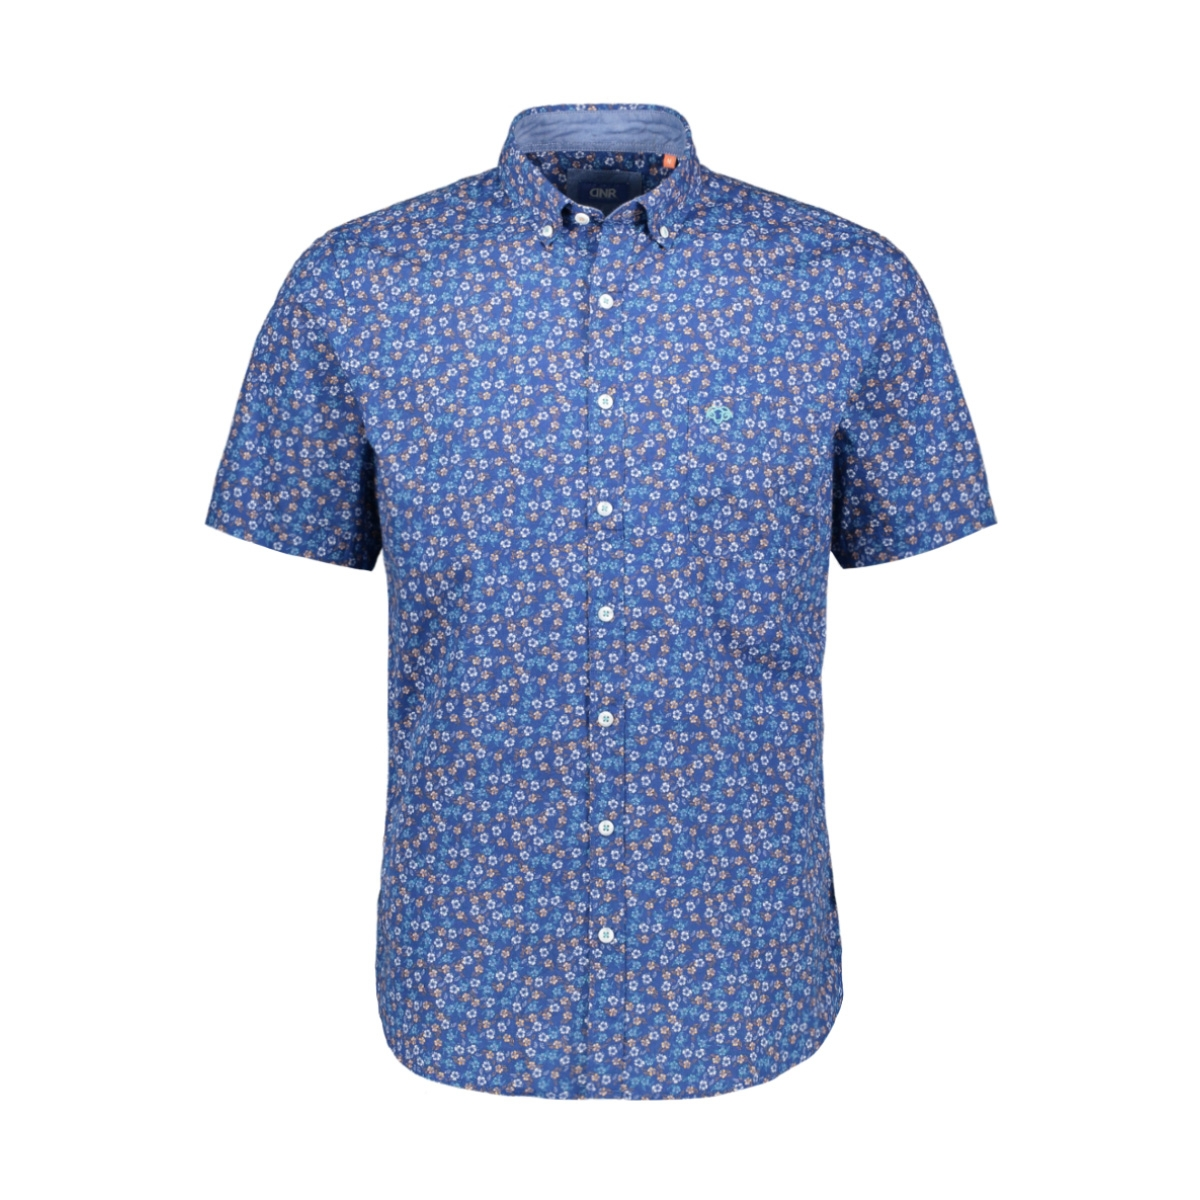 bloem overhemd 39008 2363 dnr overhemd 79 blauw combi